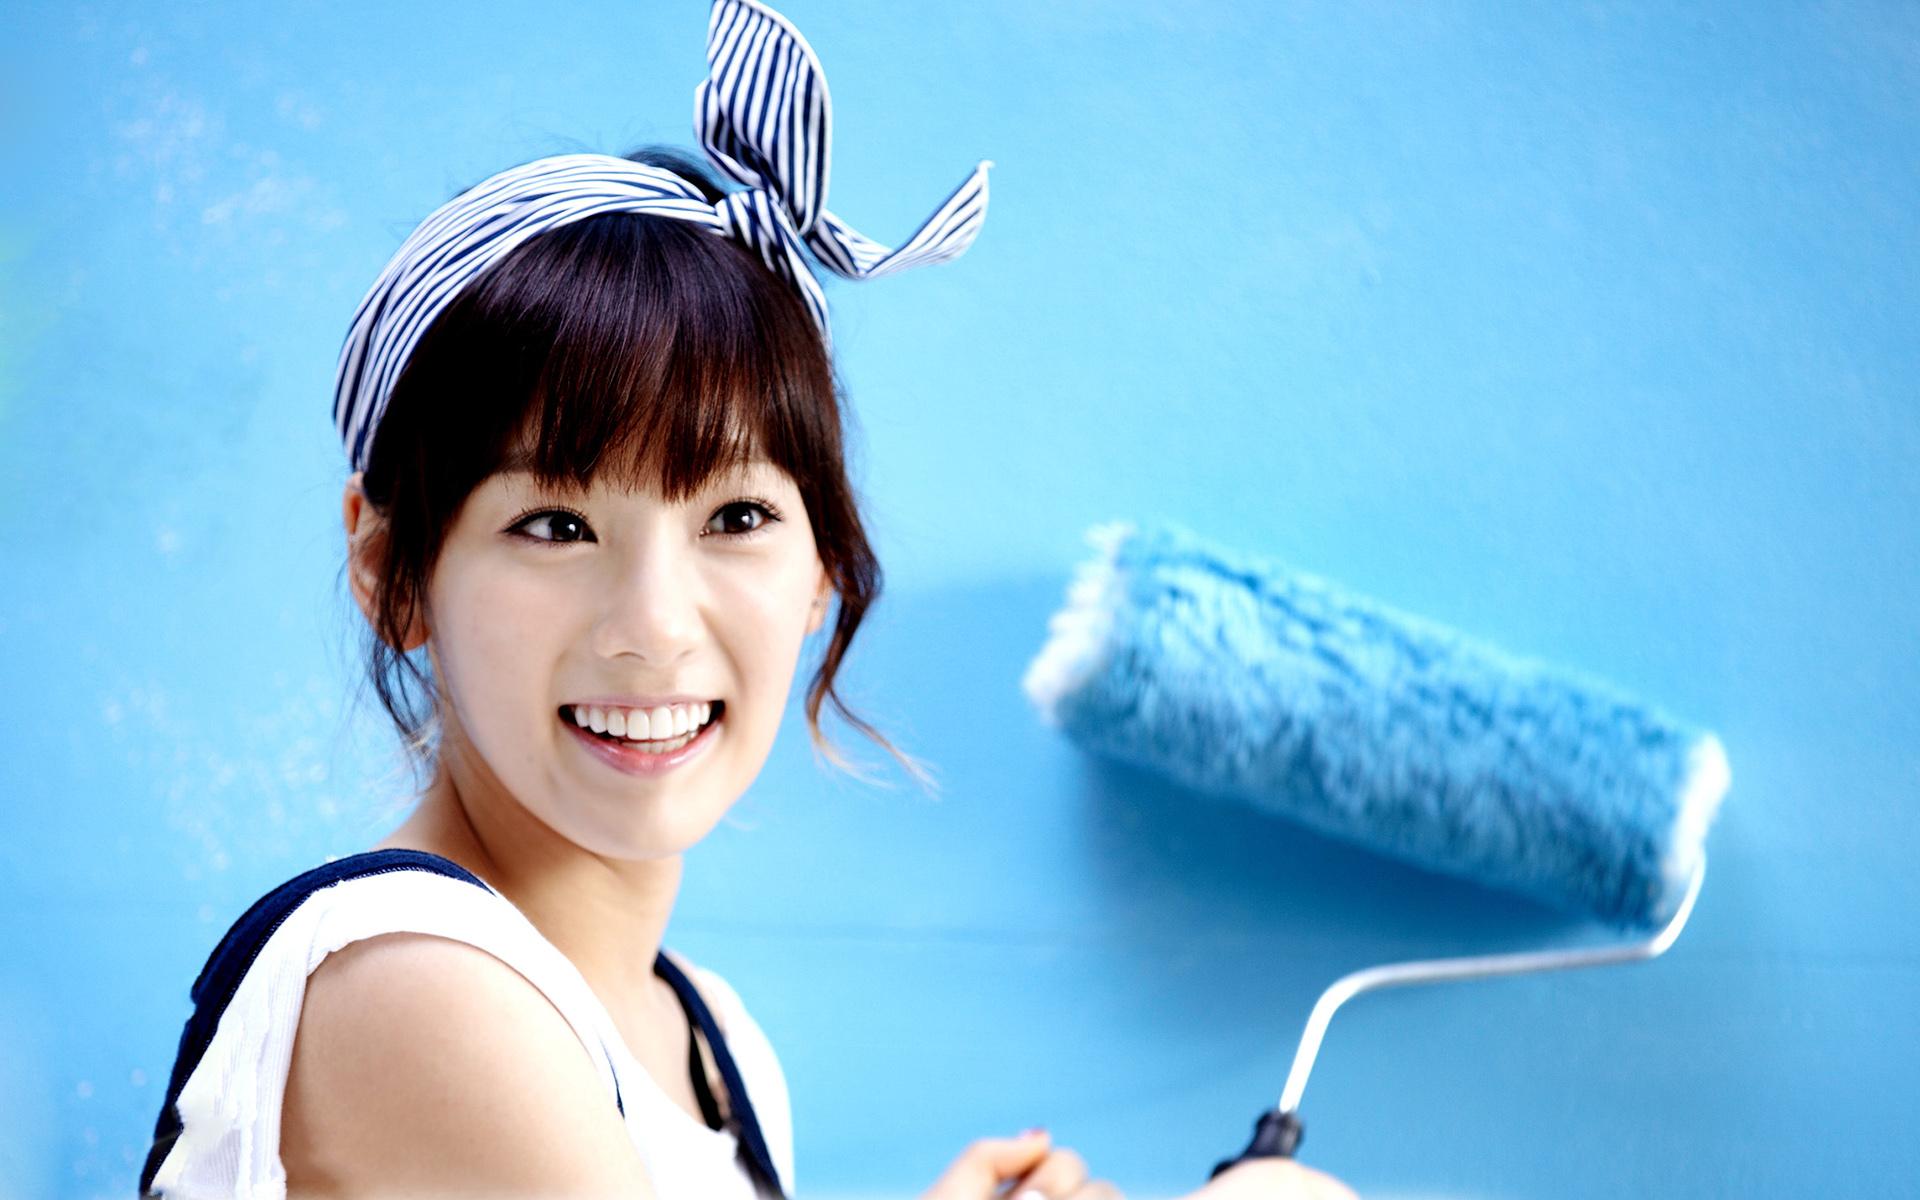 cute korean wallpaper 1920x1200